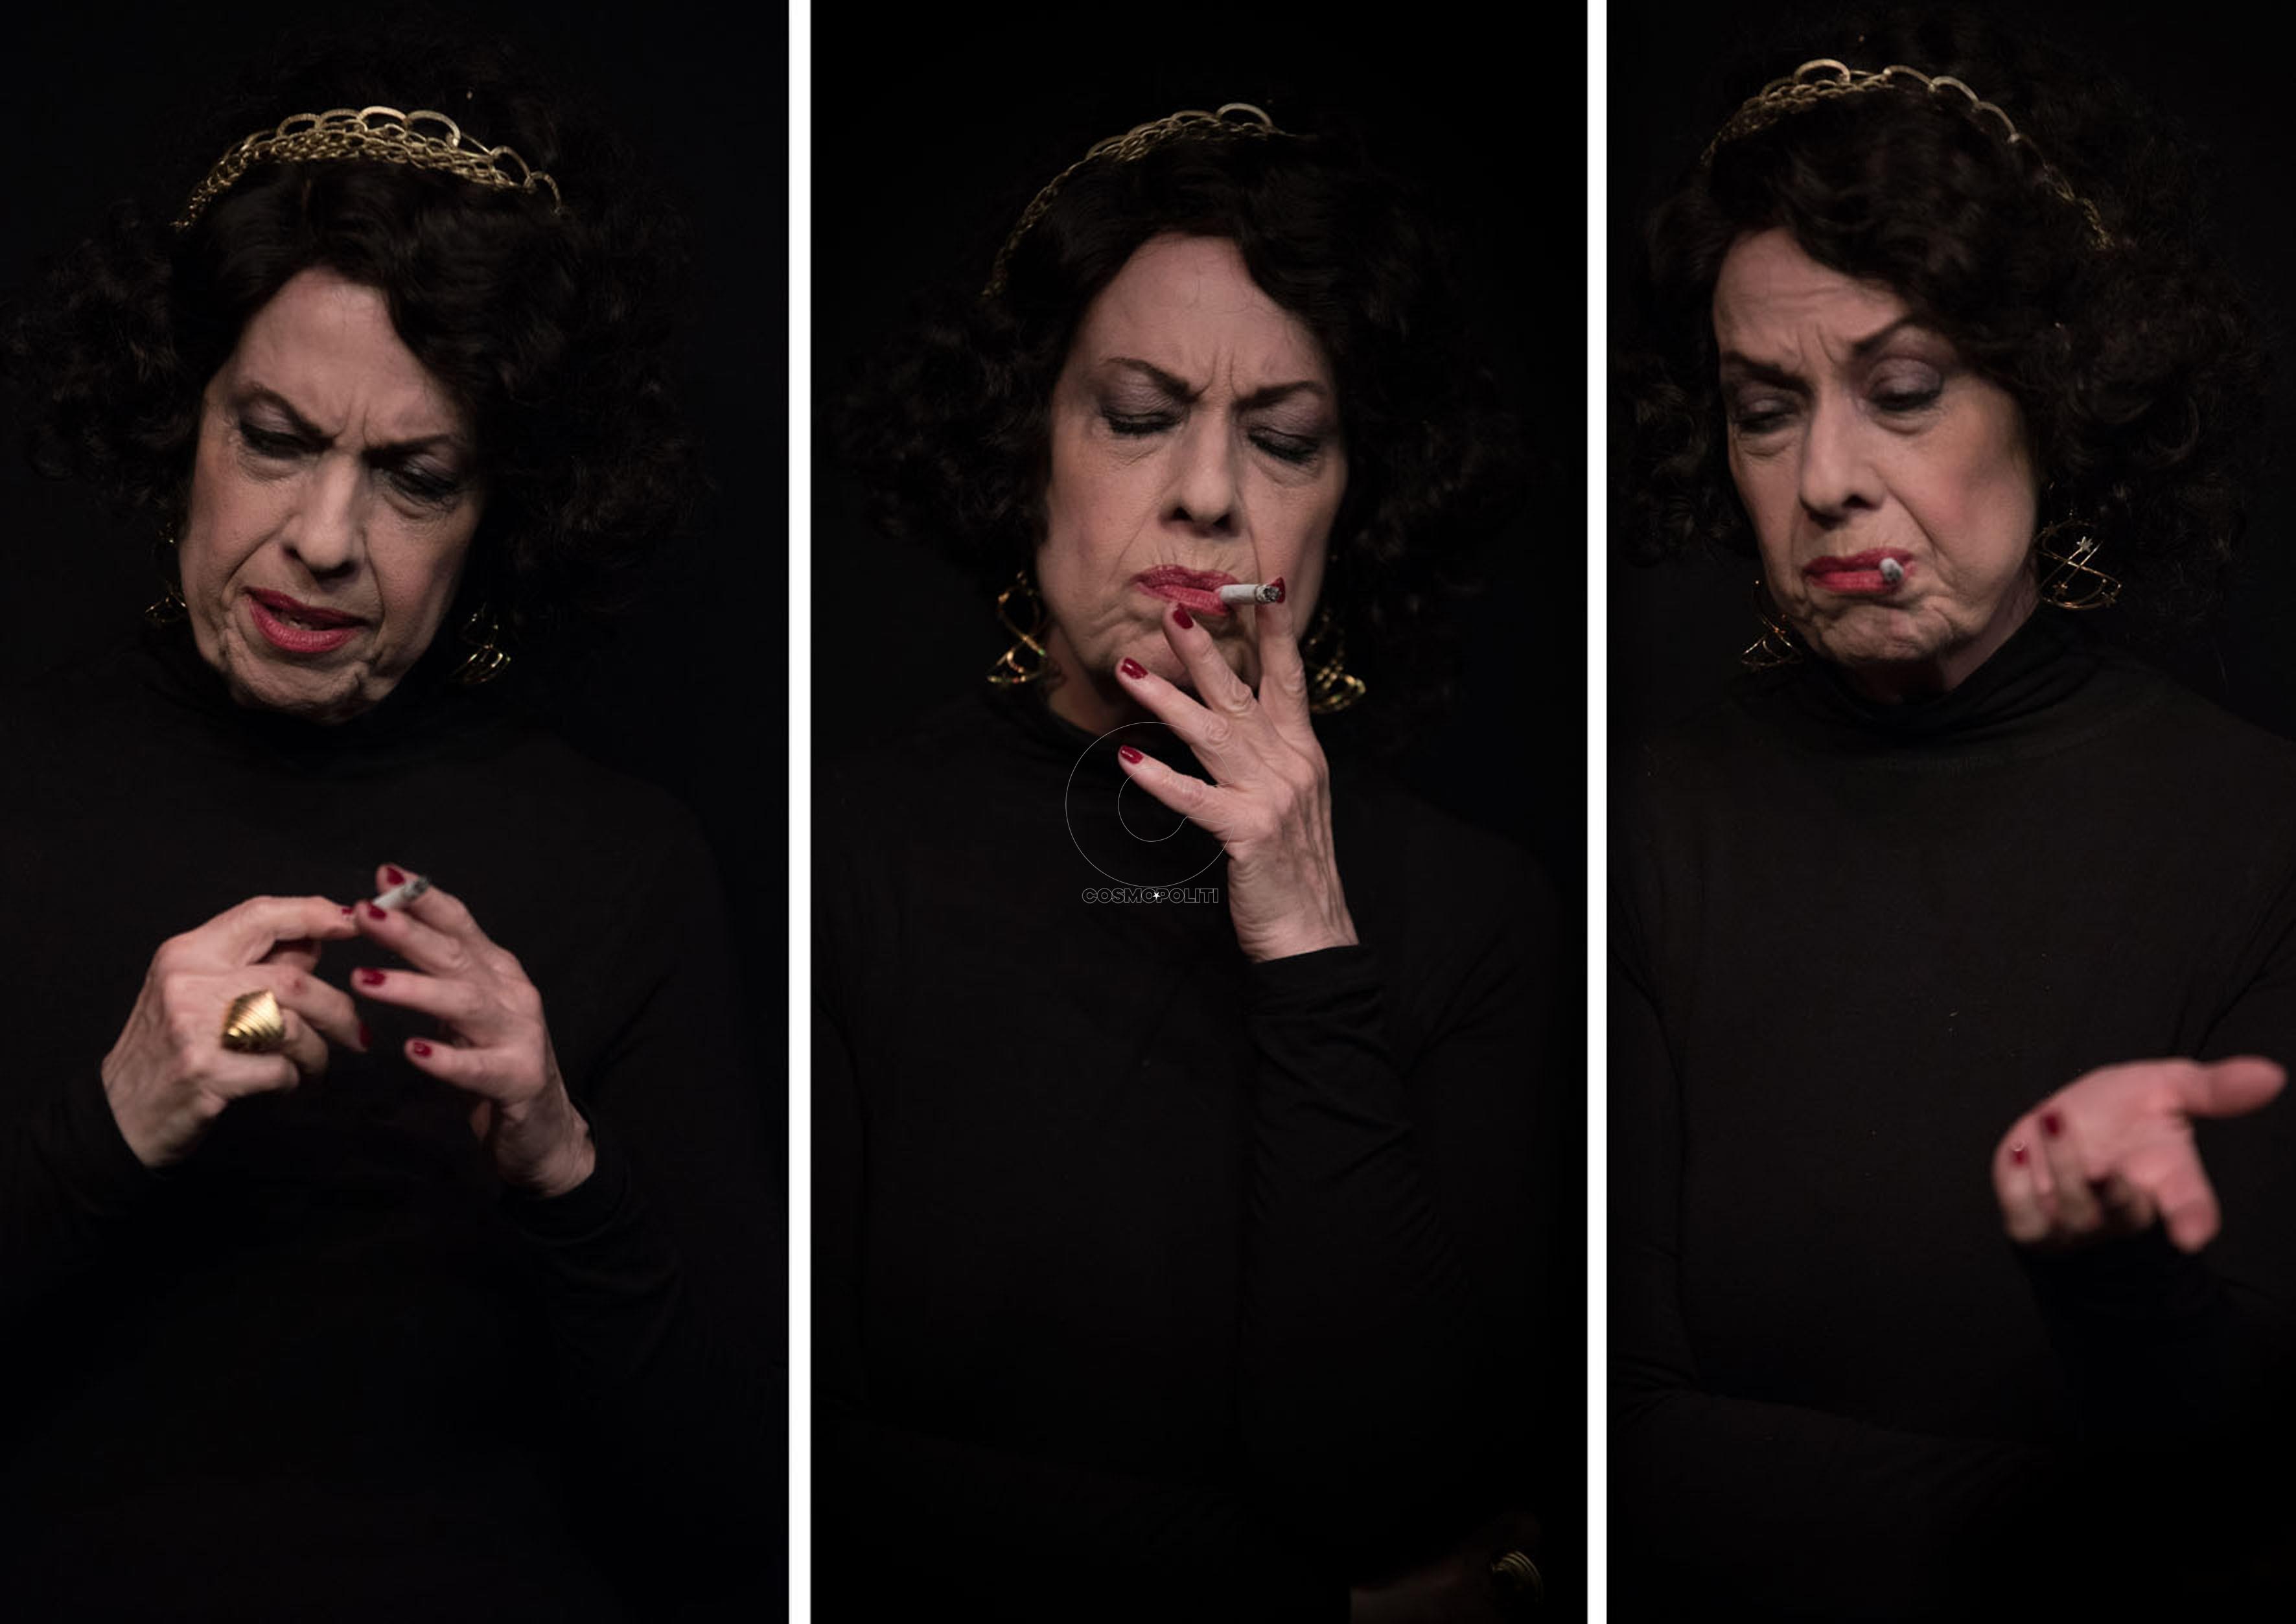 ''ROZA ESKENAZY'' NEFELH ORFANOY - PHOTO BY KALABROYZIWTHS ANDREAS @andrekal